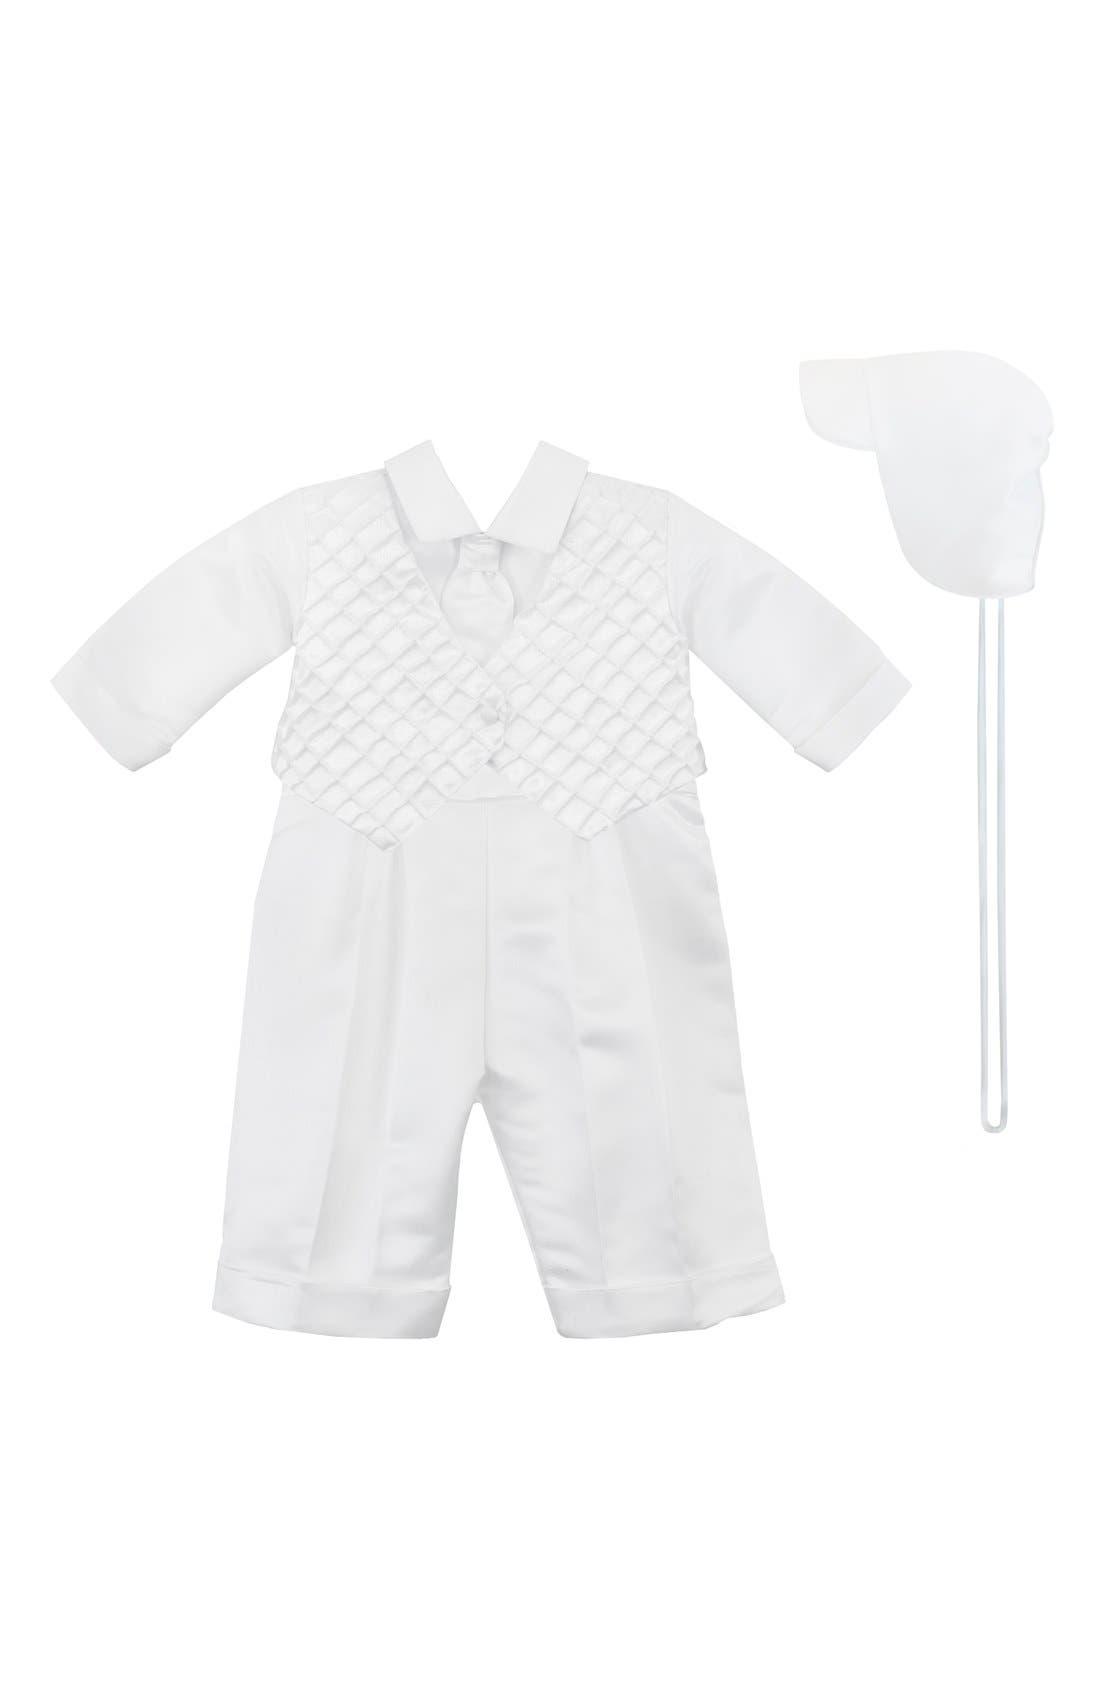 C.I. CASTRO & CO. Christening Shirt, Pants & Hat, Main, color, 100